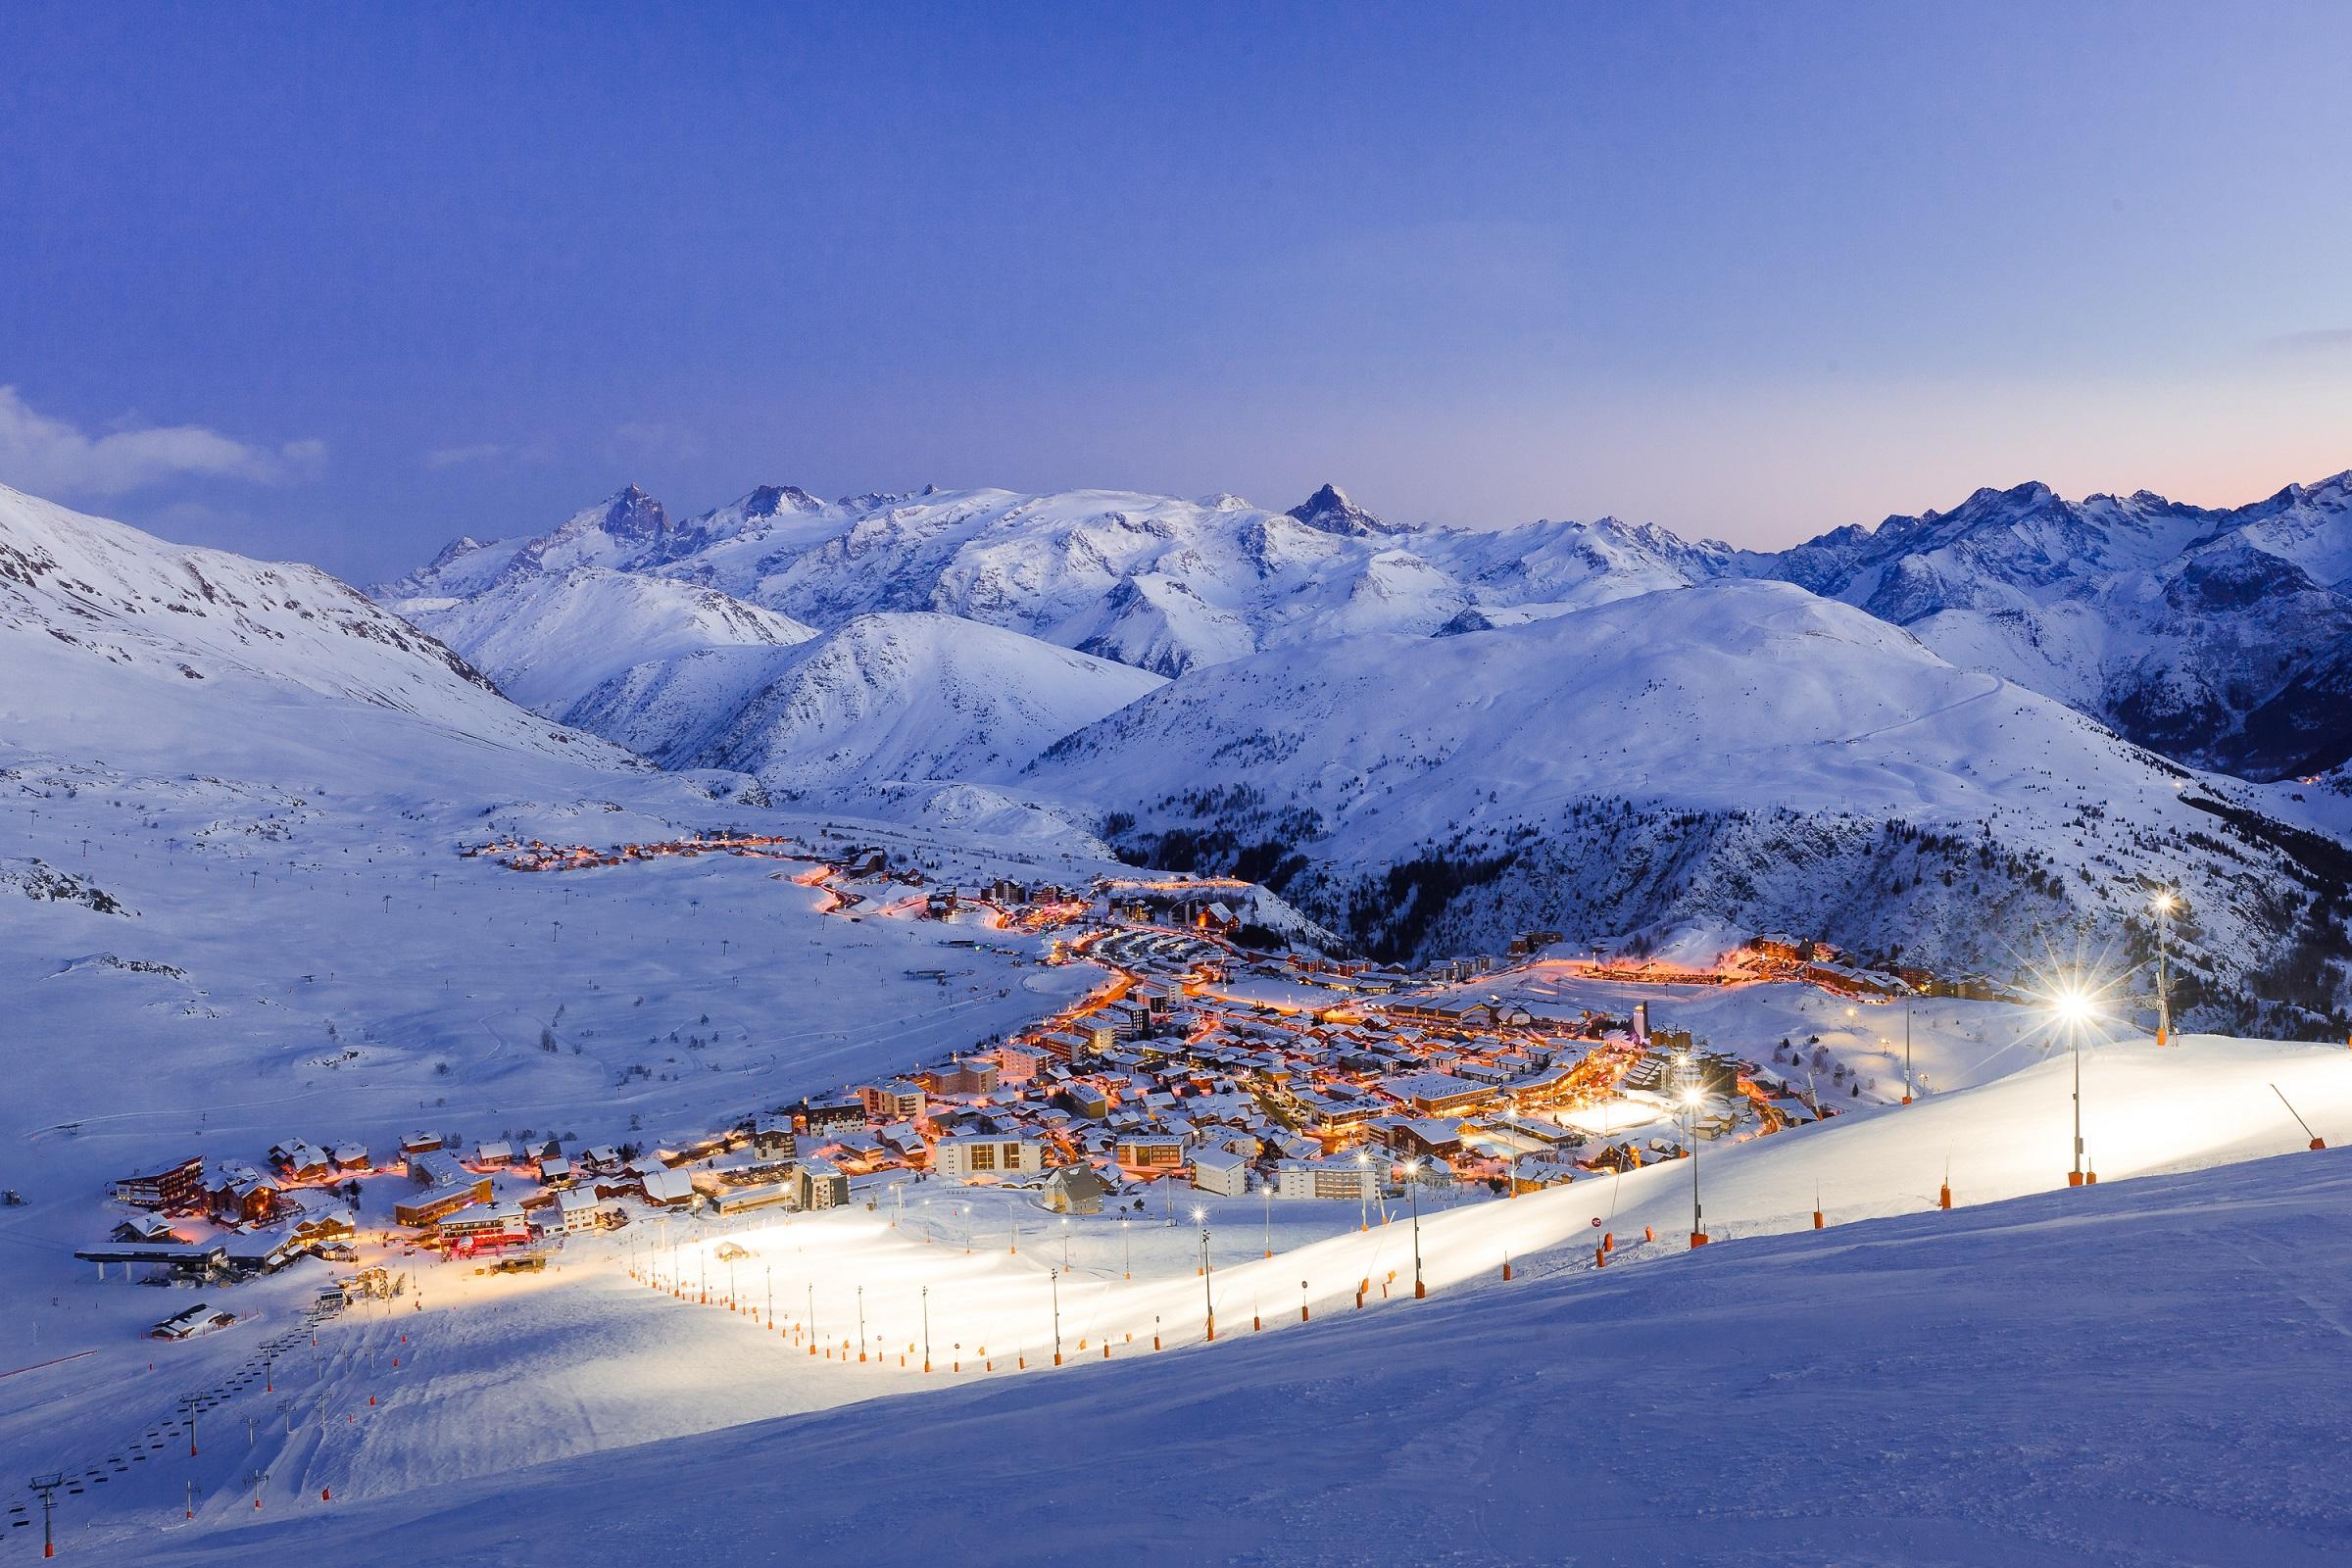 Tomorrowland Shares Breathtaking Photos  Its New Winter Festival Destination